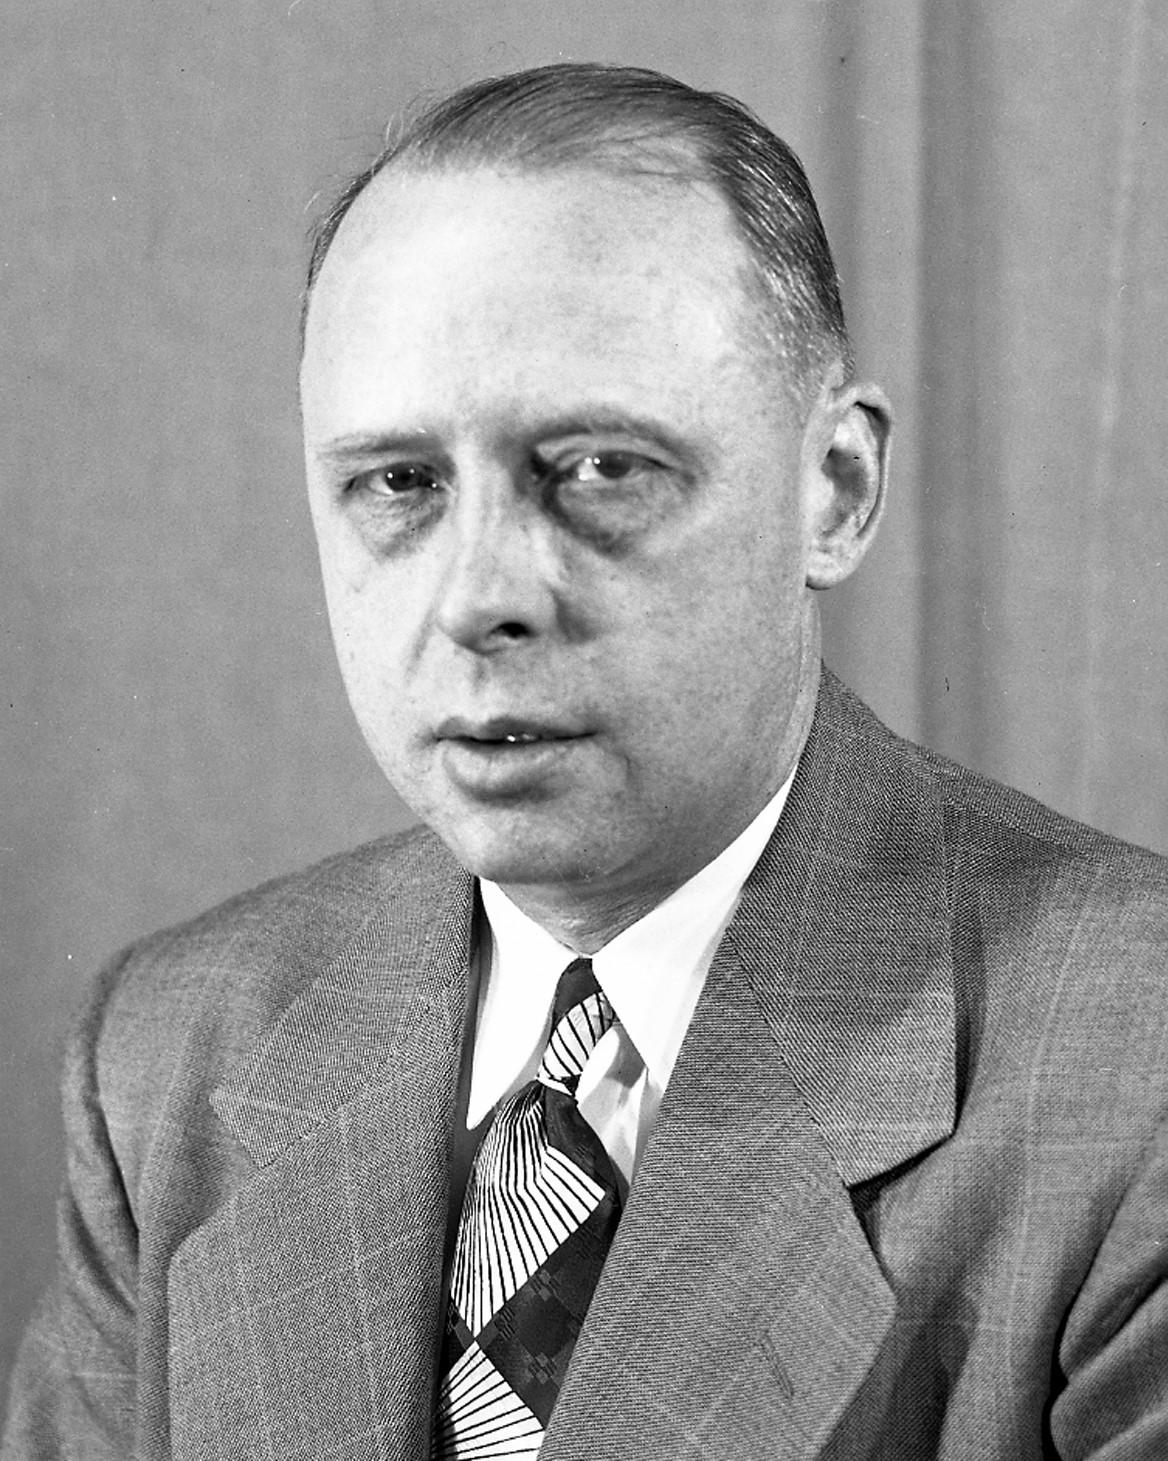 Detective Erwin W. Schink | Detroit Police Department, Michigan